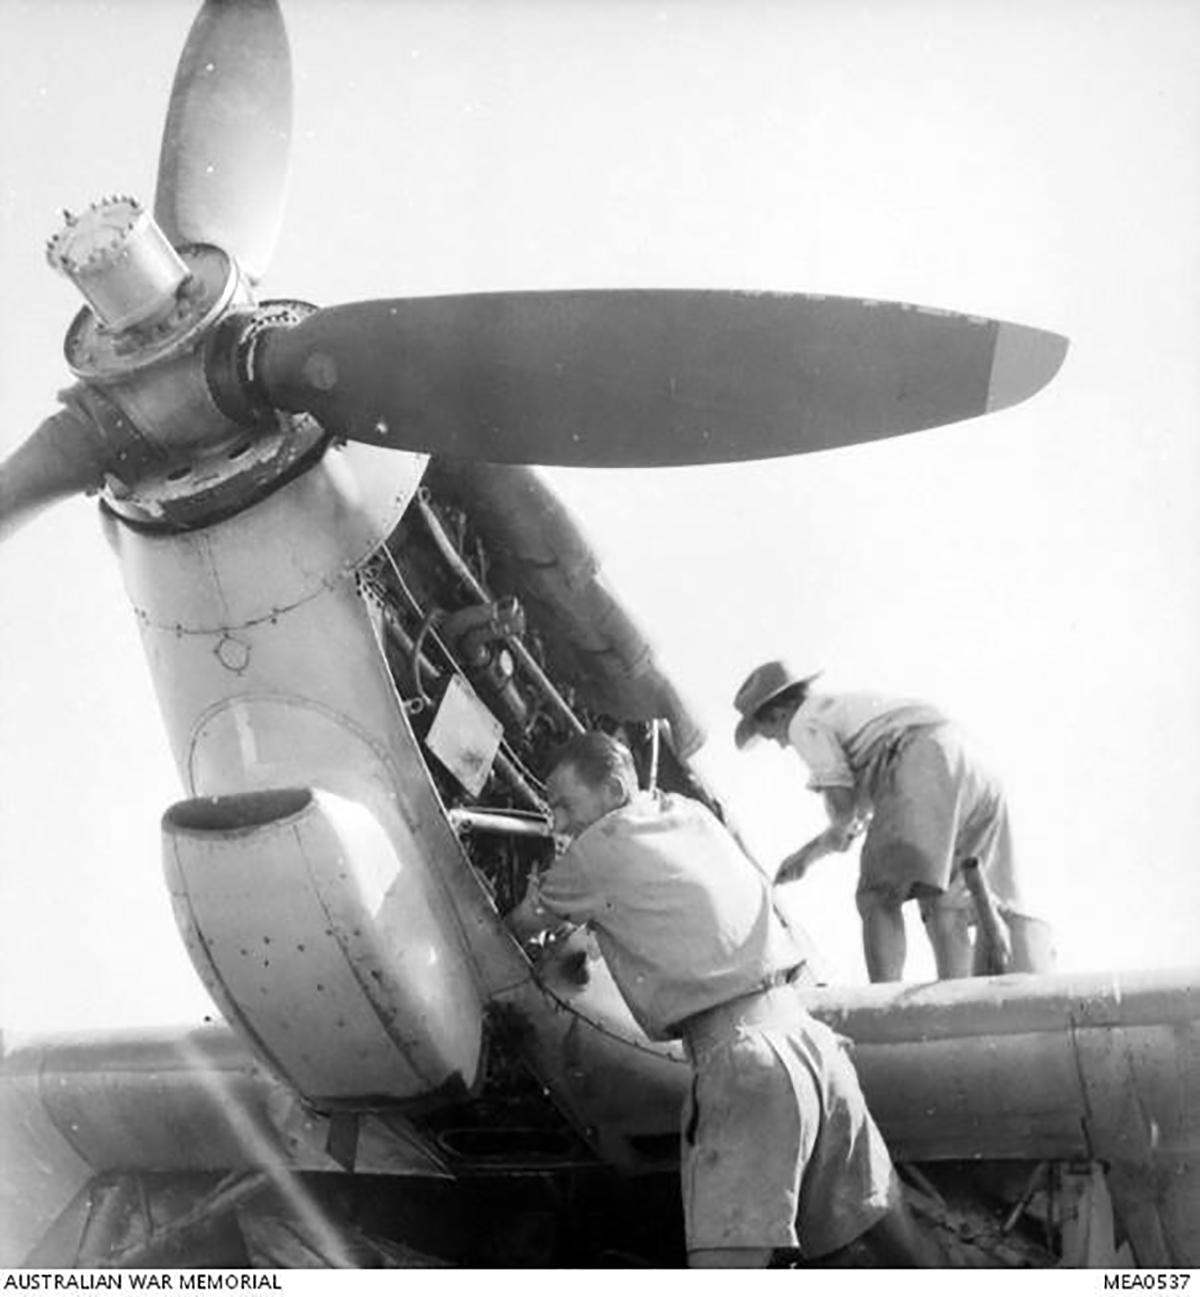 Hurricane IIc Trop RAAF 451Sqn propeller installation Egypt AWM 03